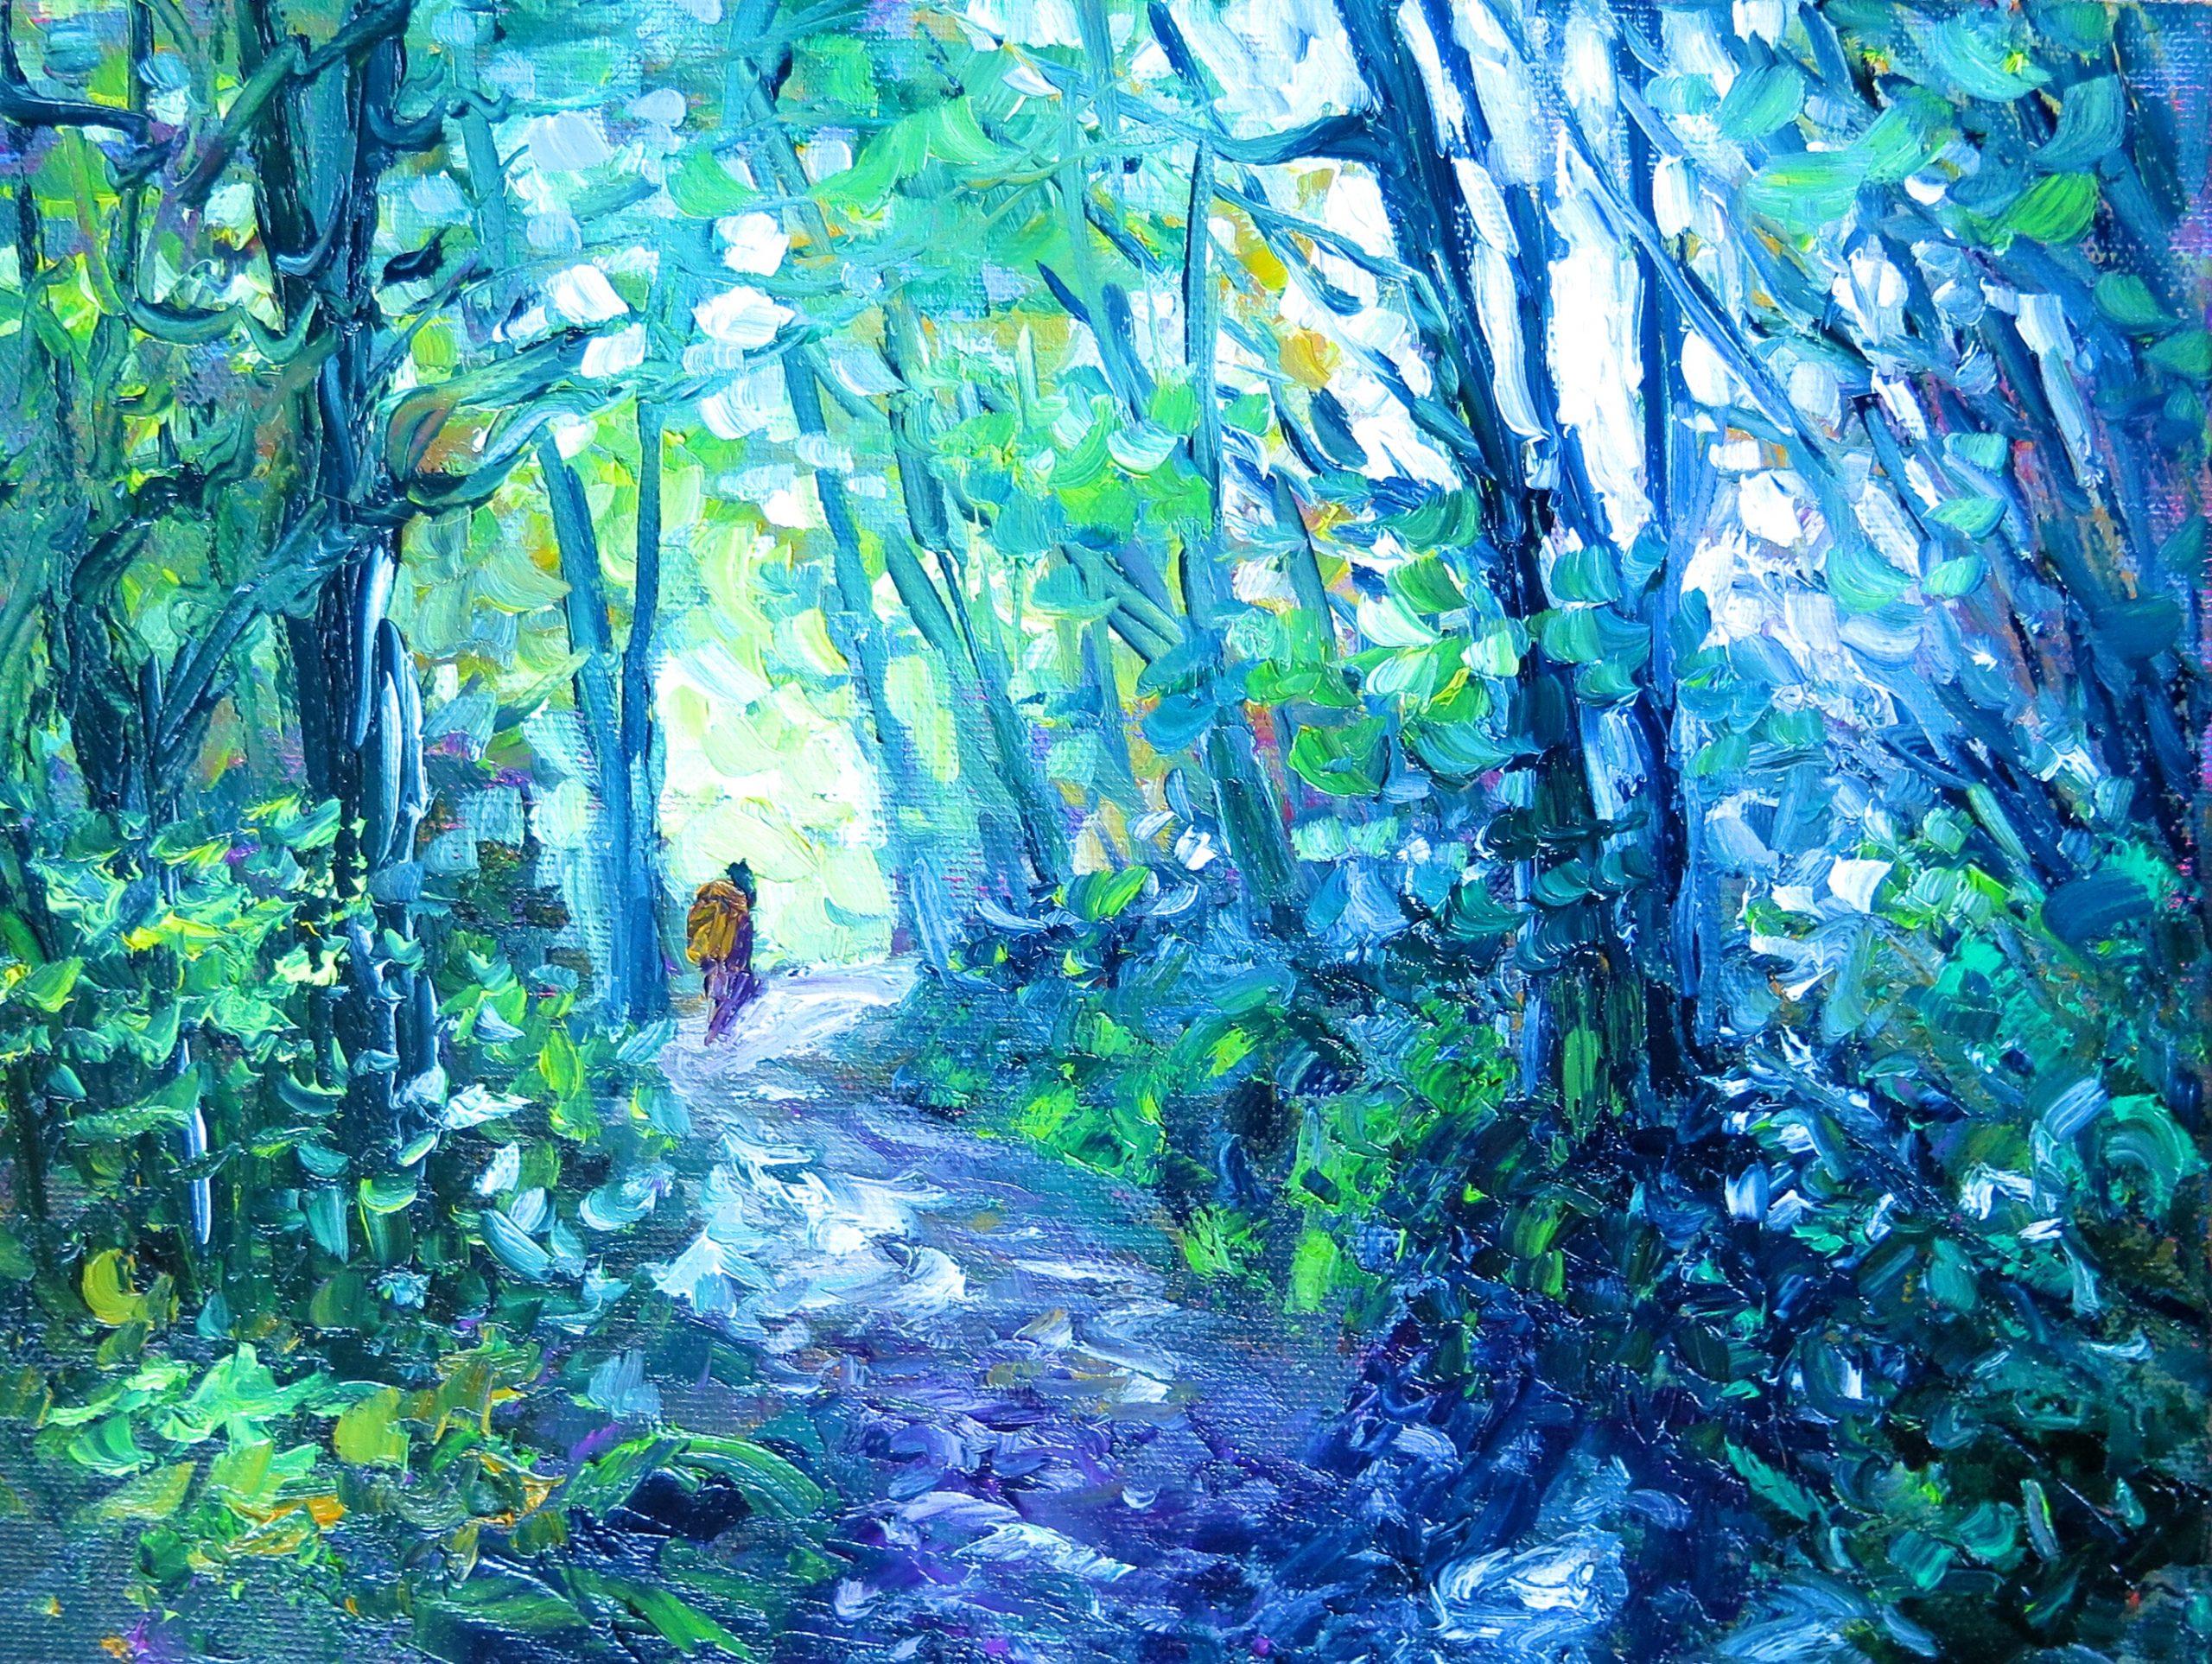 Bush Walk, helenblairsart, Giclee print